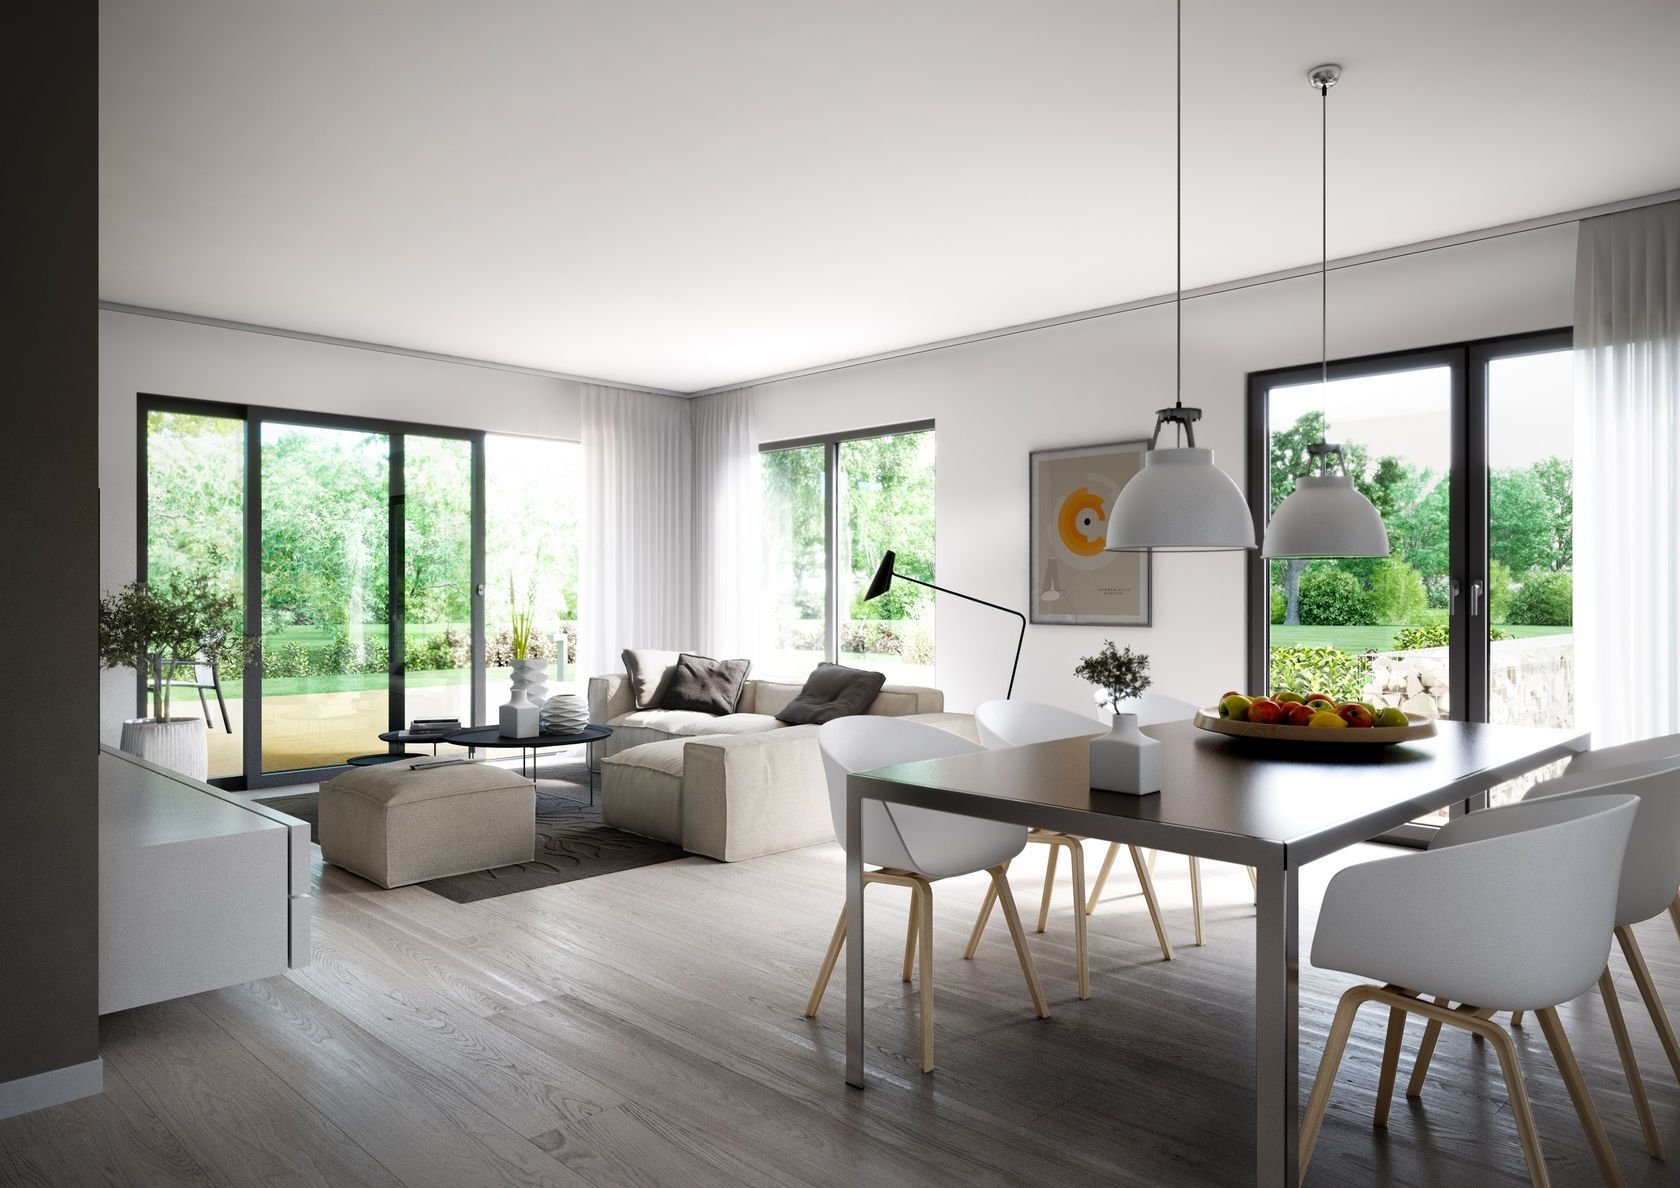 KernHaus Futura Bauhaus Wohnzimmer Haus Inspo